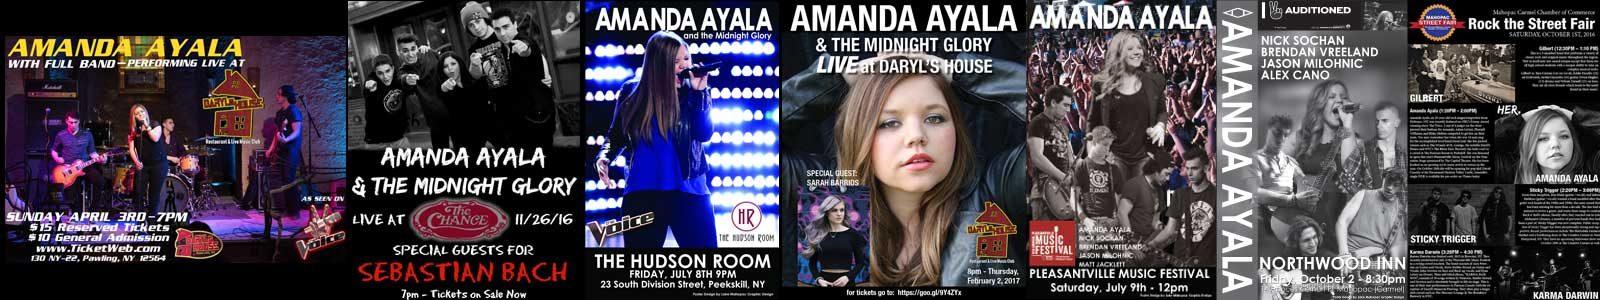 Amanda Ayala Performance Posters